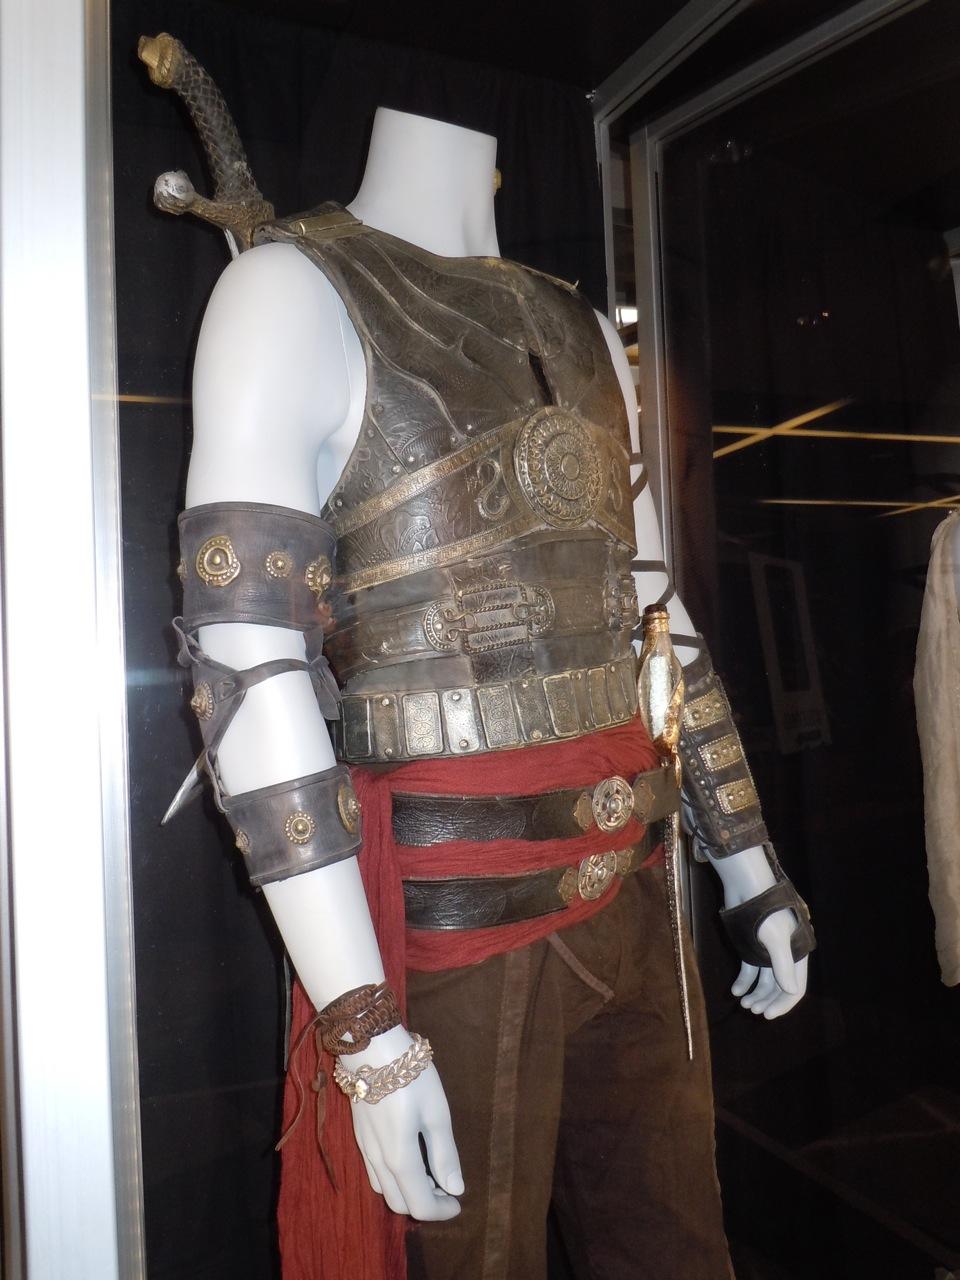 Prince of Persia Dastan movie costume Prince of Persia Jake Gyllenhaal costume ... & Hollywood Movie Costumes and Props: Dastanu0027s Prince of Persia ...